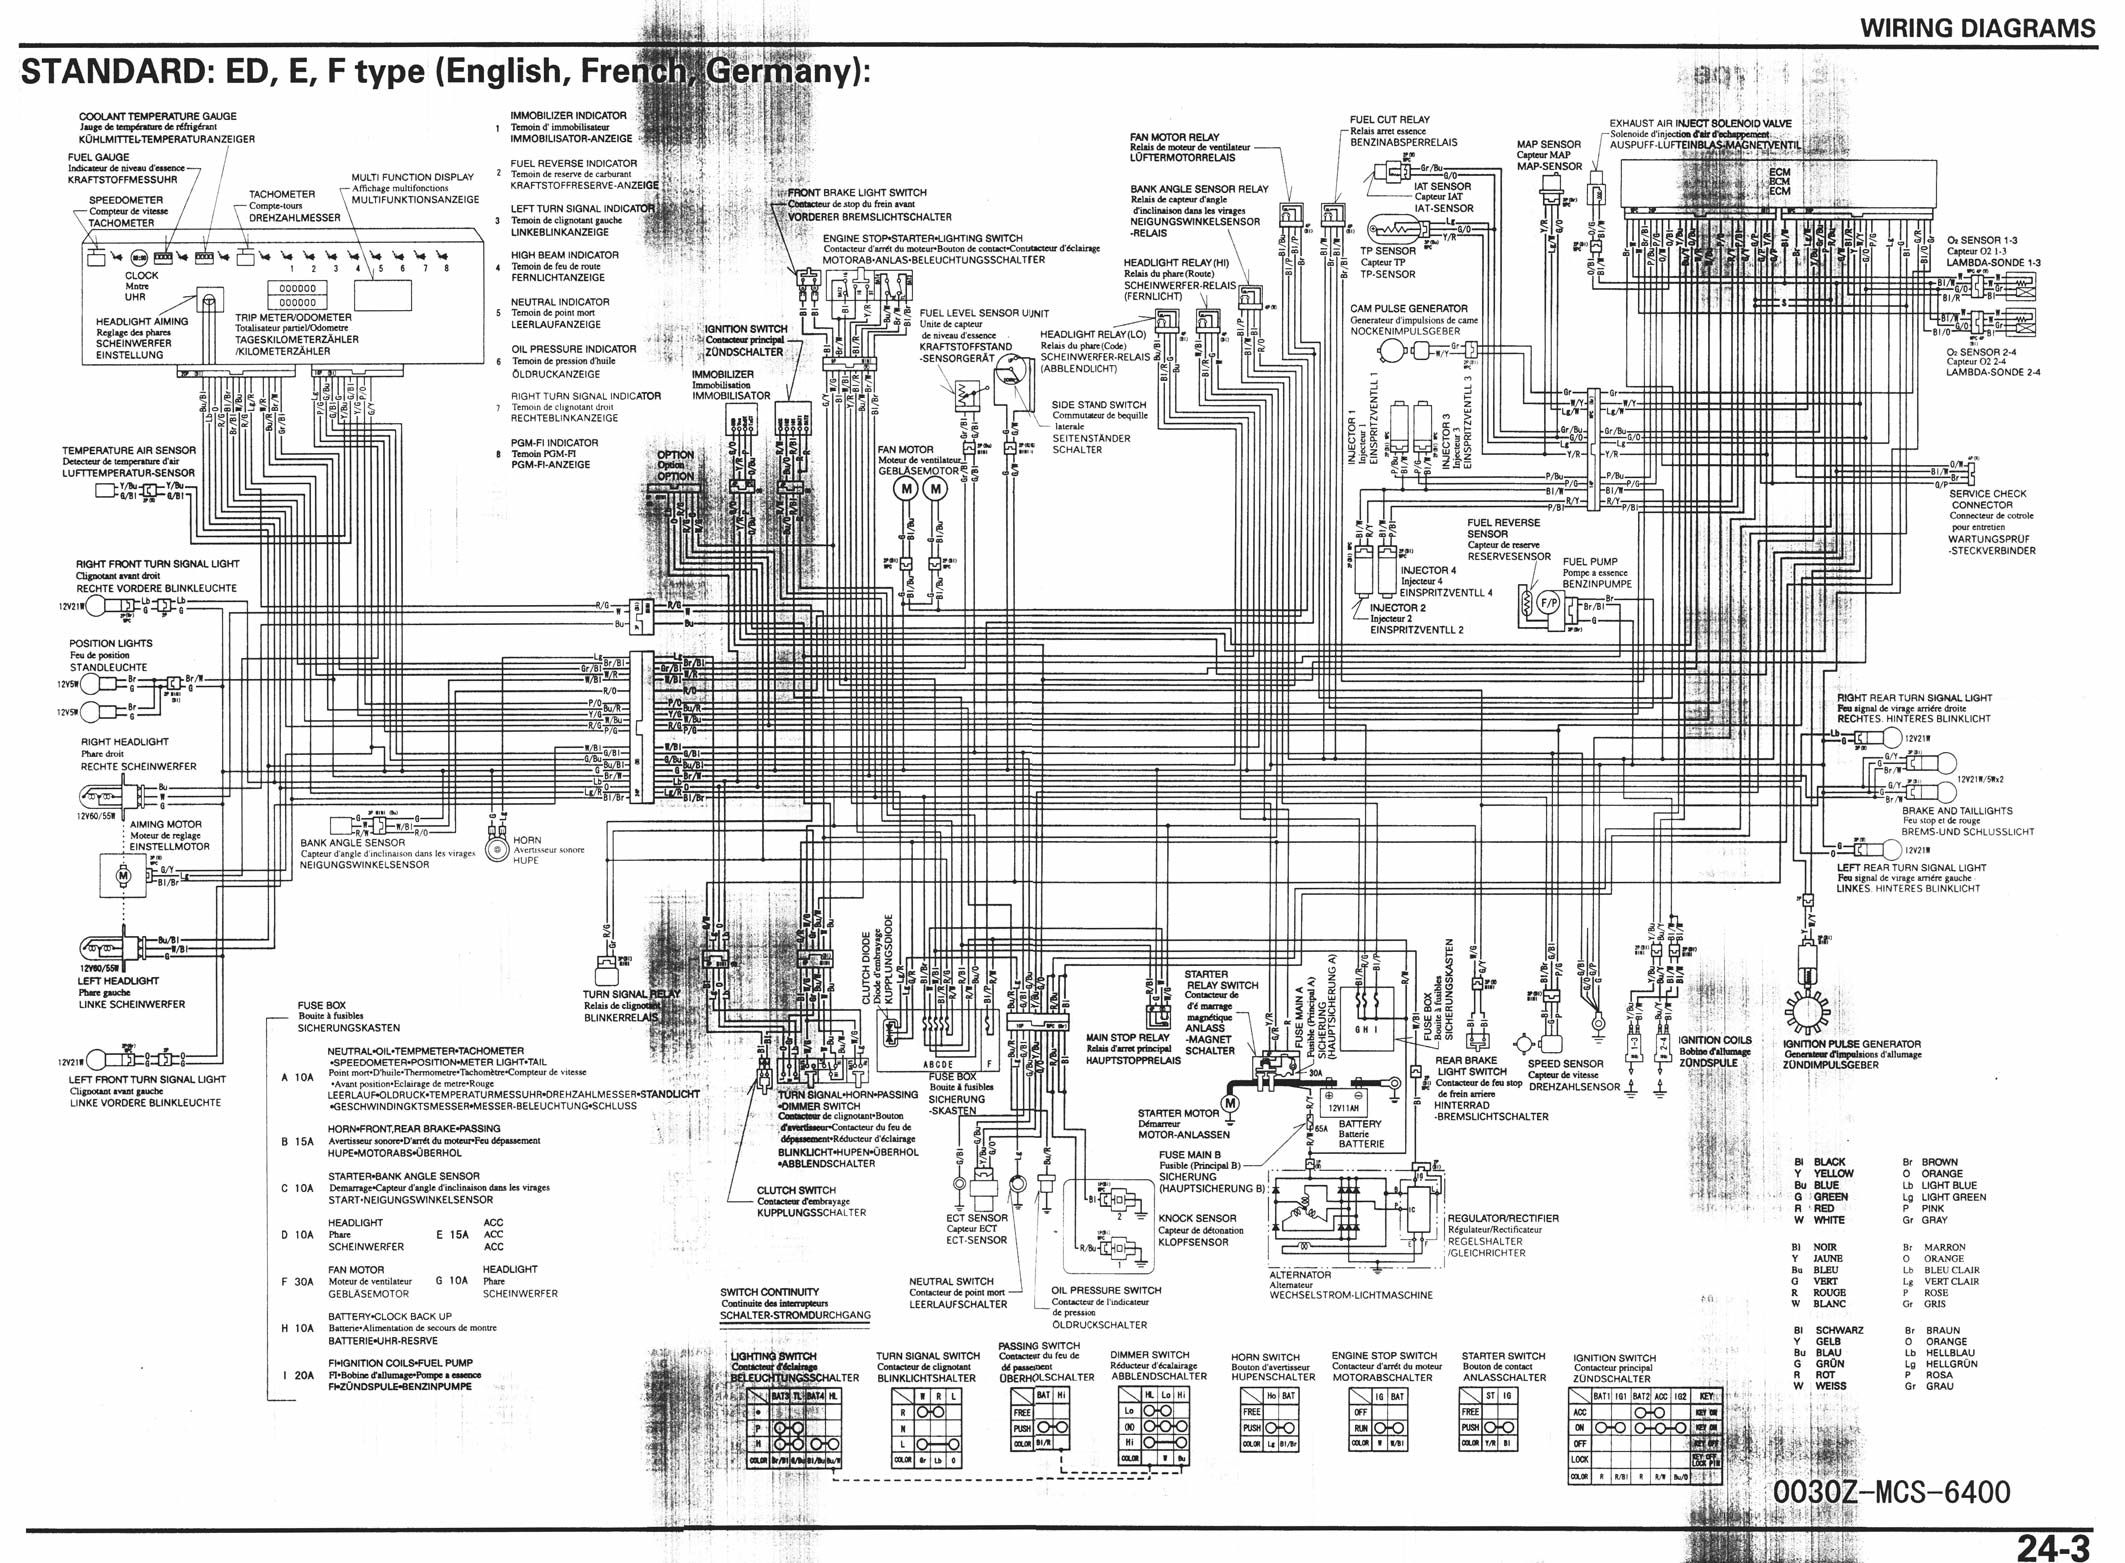 2015 Bmw G650gs Wiring Diagram